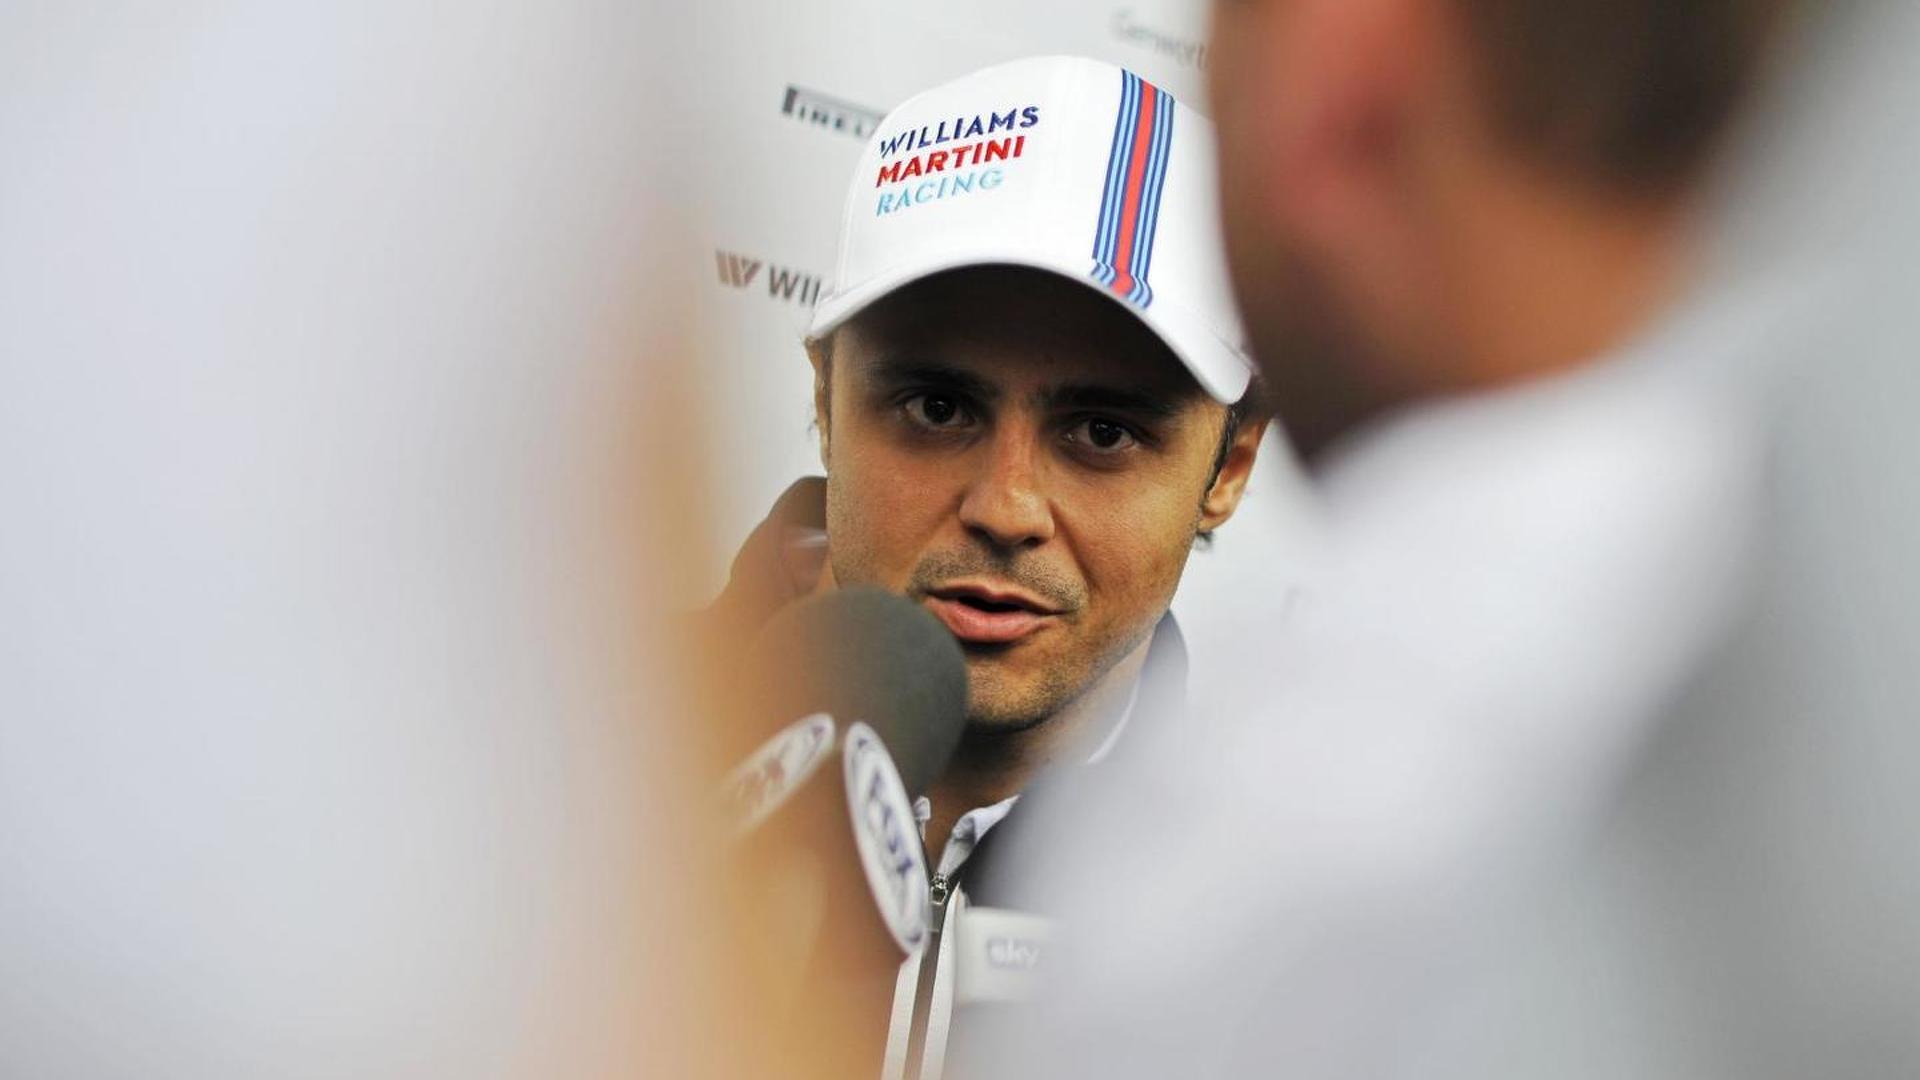 'Pressure effect' is Vettel's new challenge - Massa